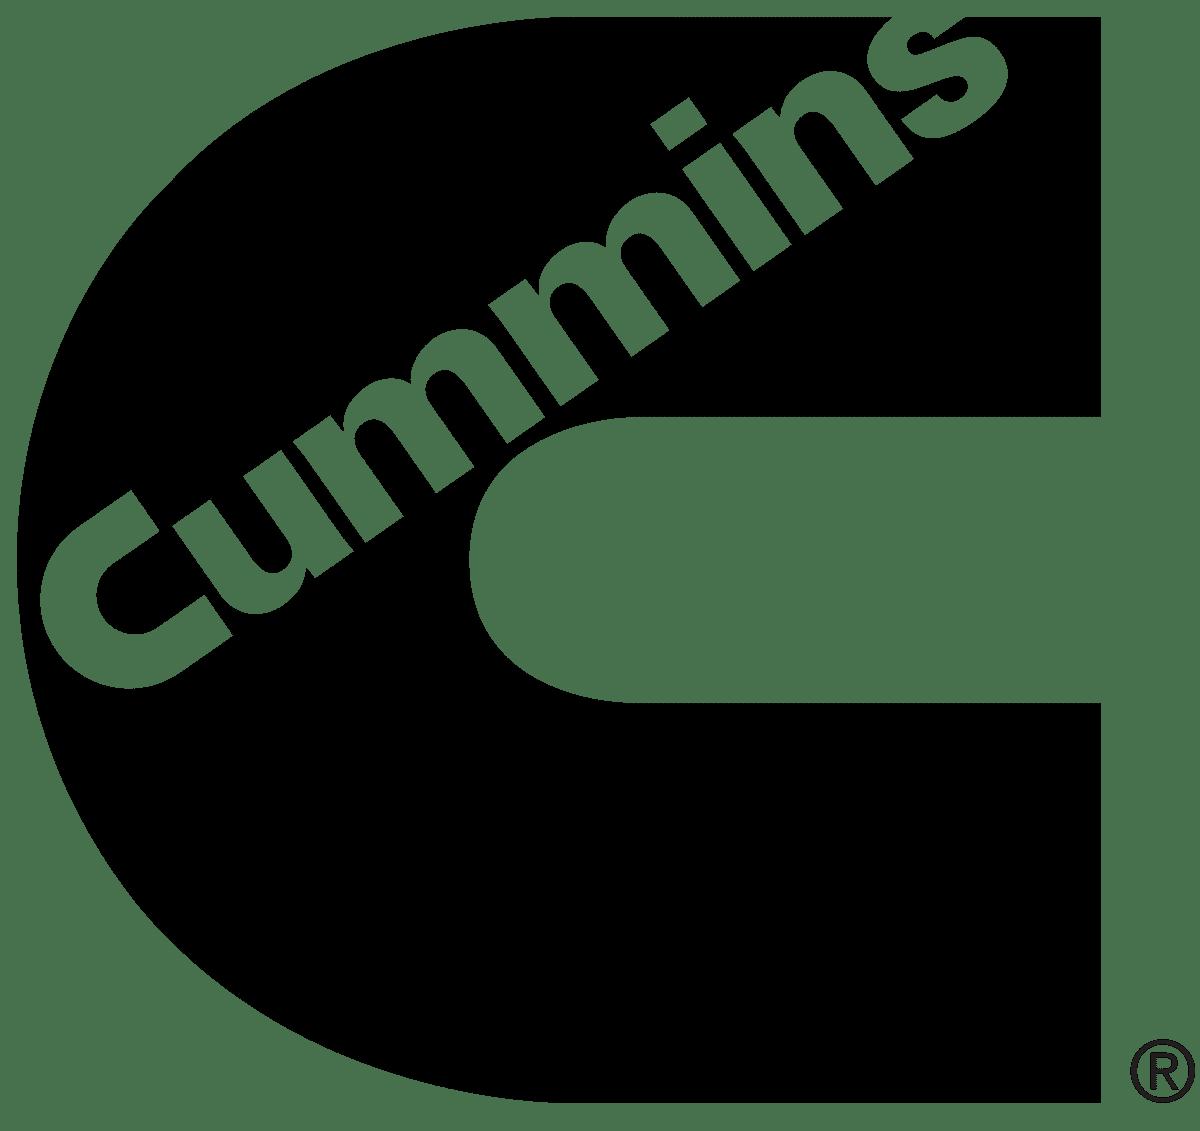 cummins - Accueil